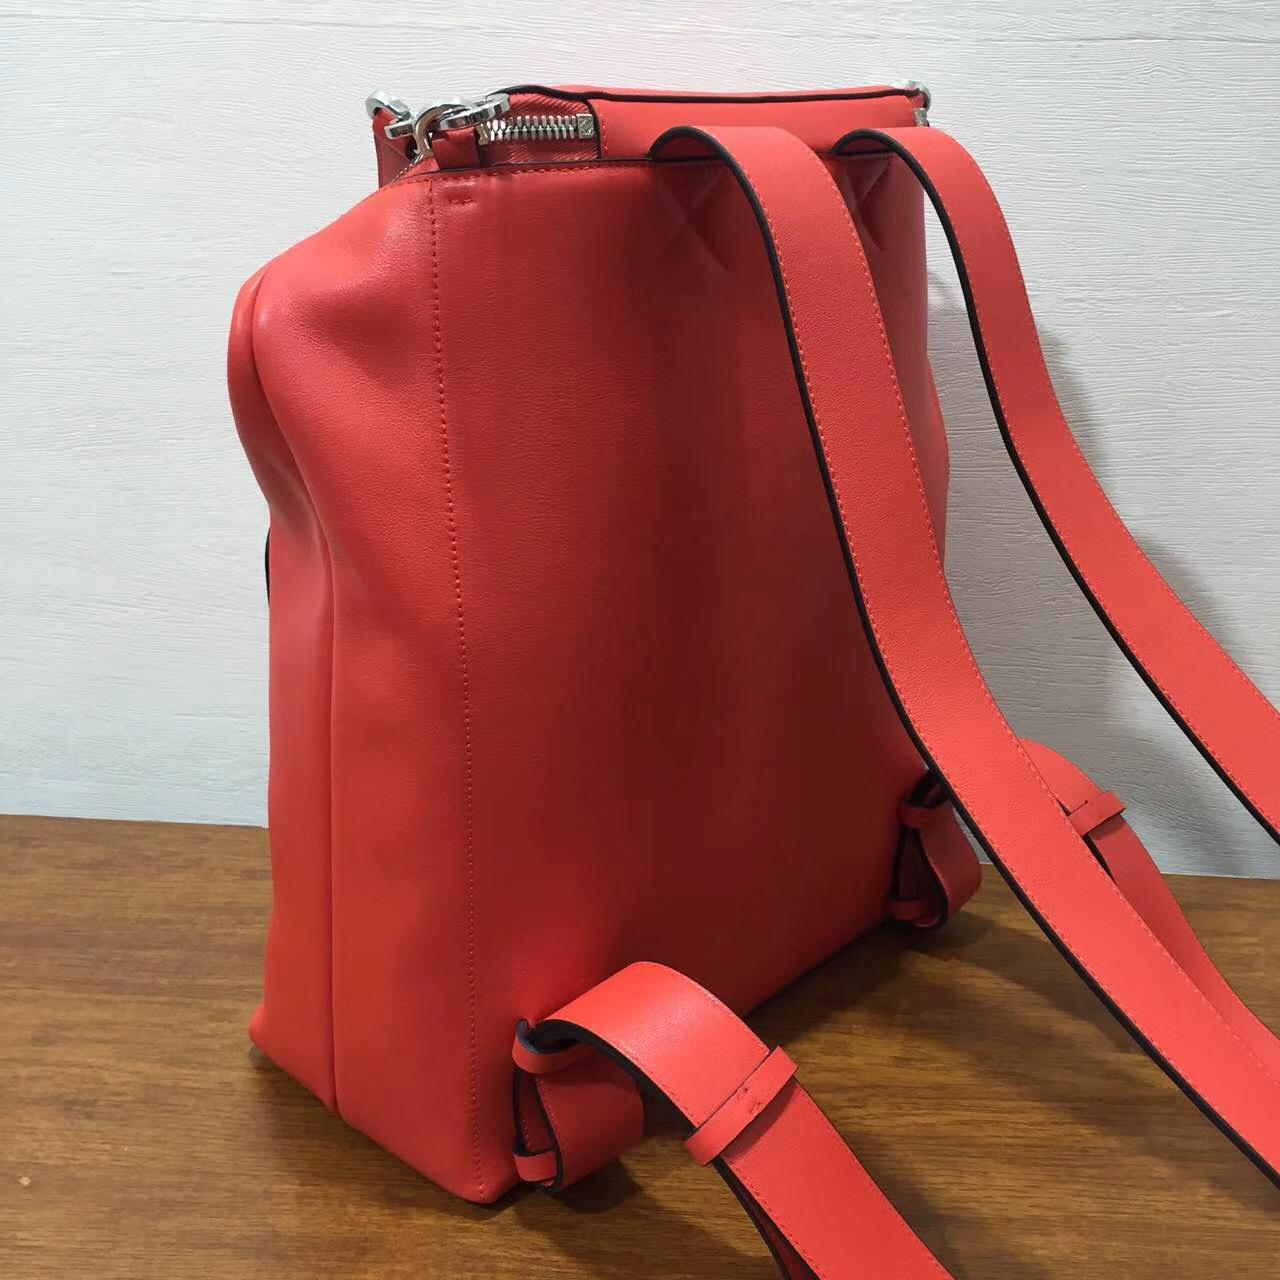 loewe 羅意威包包官網 Goya Backpack 橘红色 經典小牛皮 Goya背包